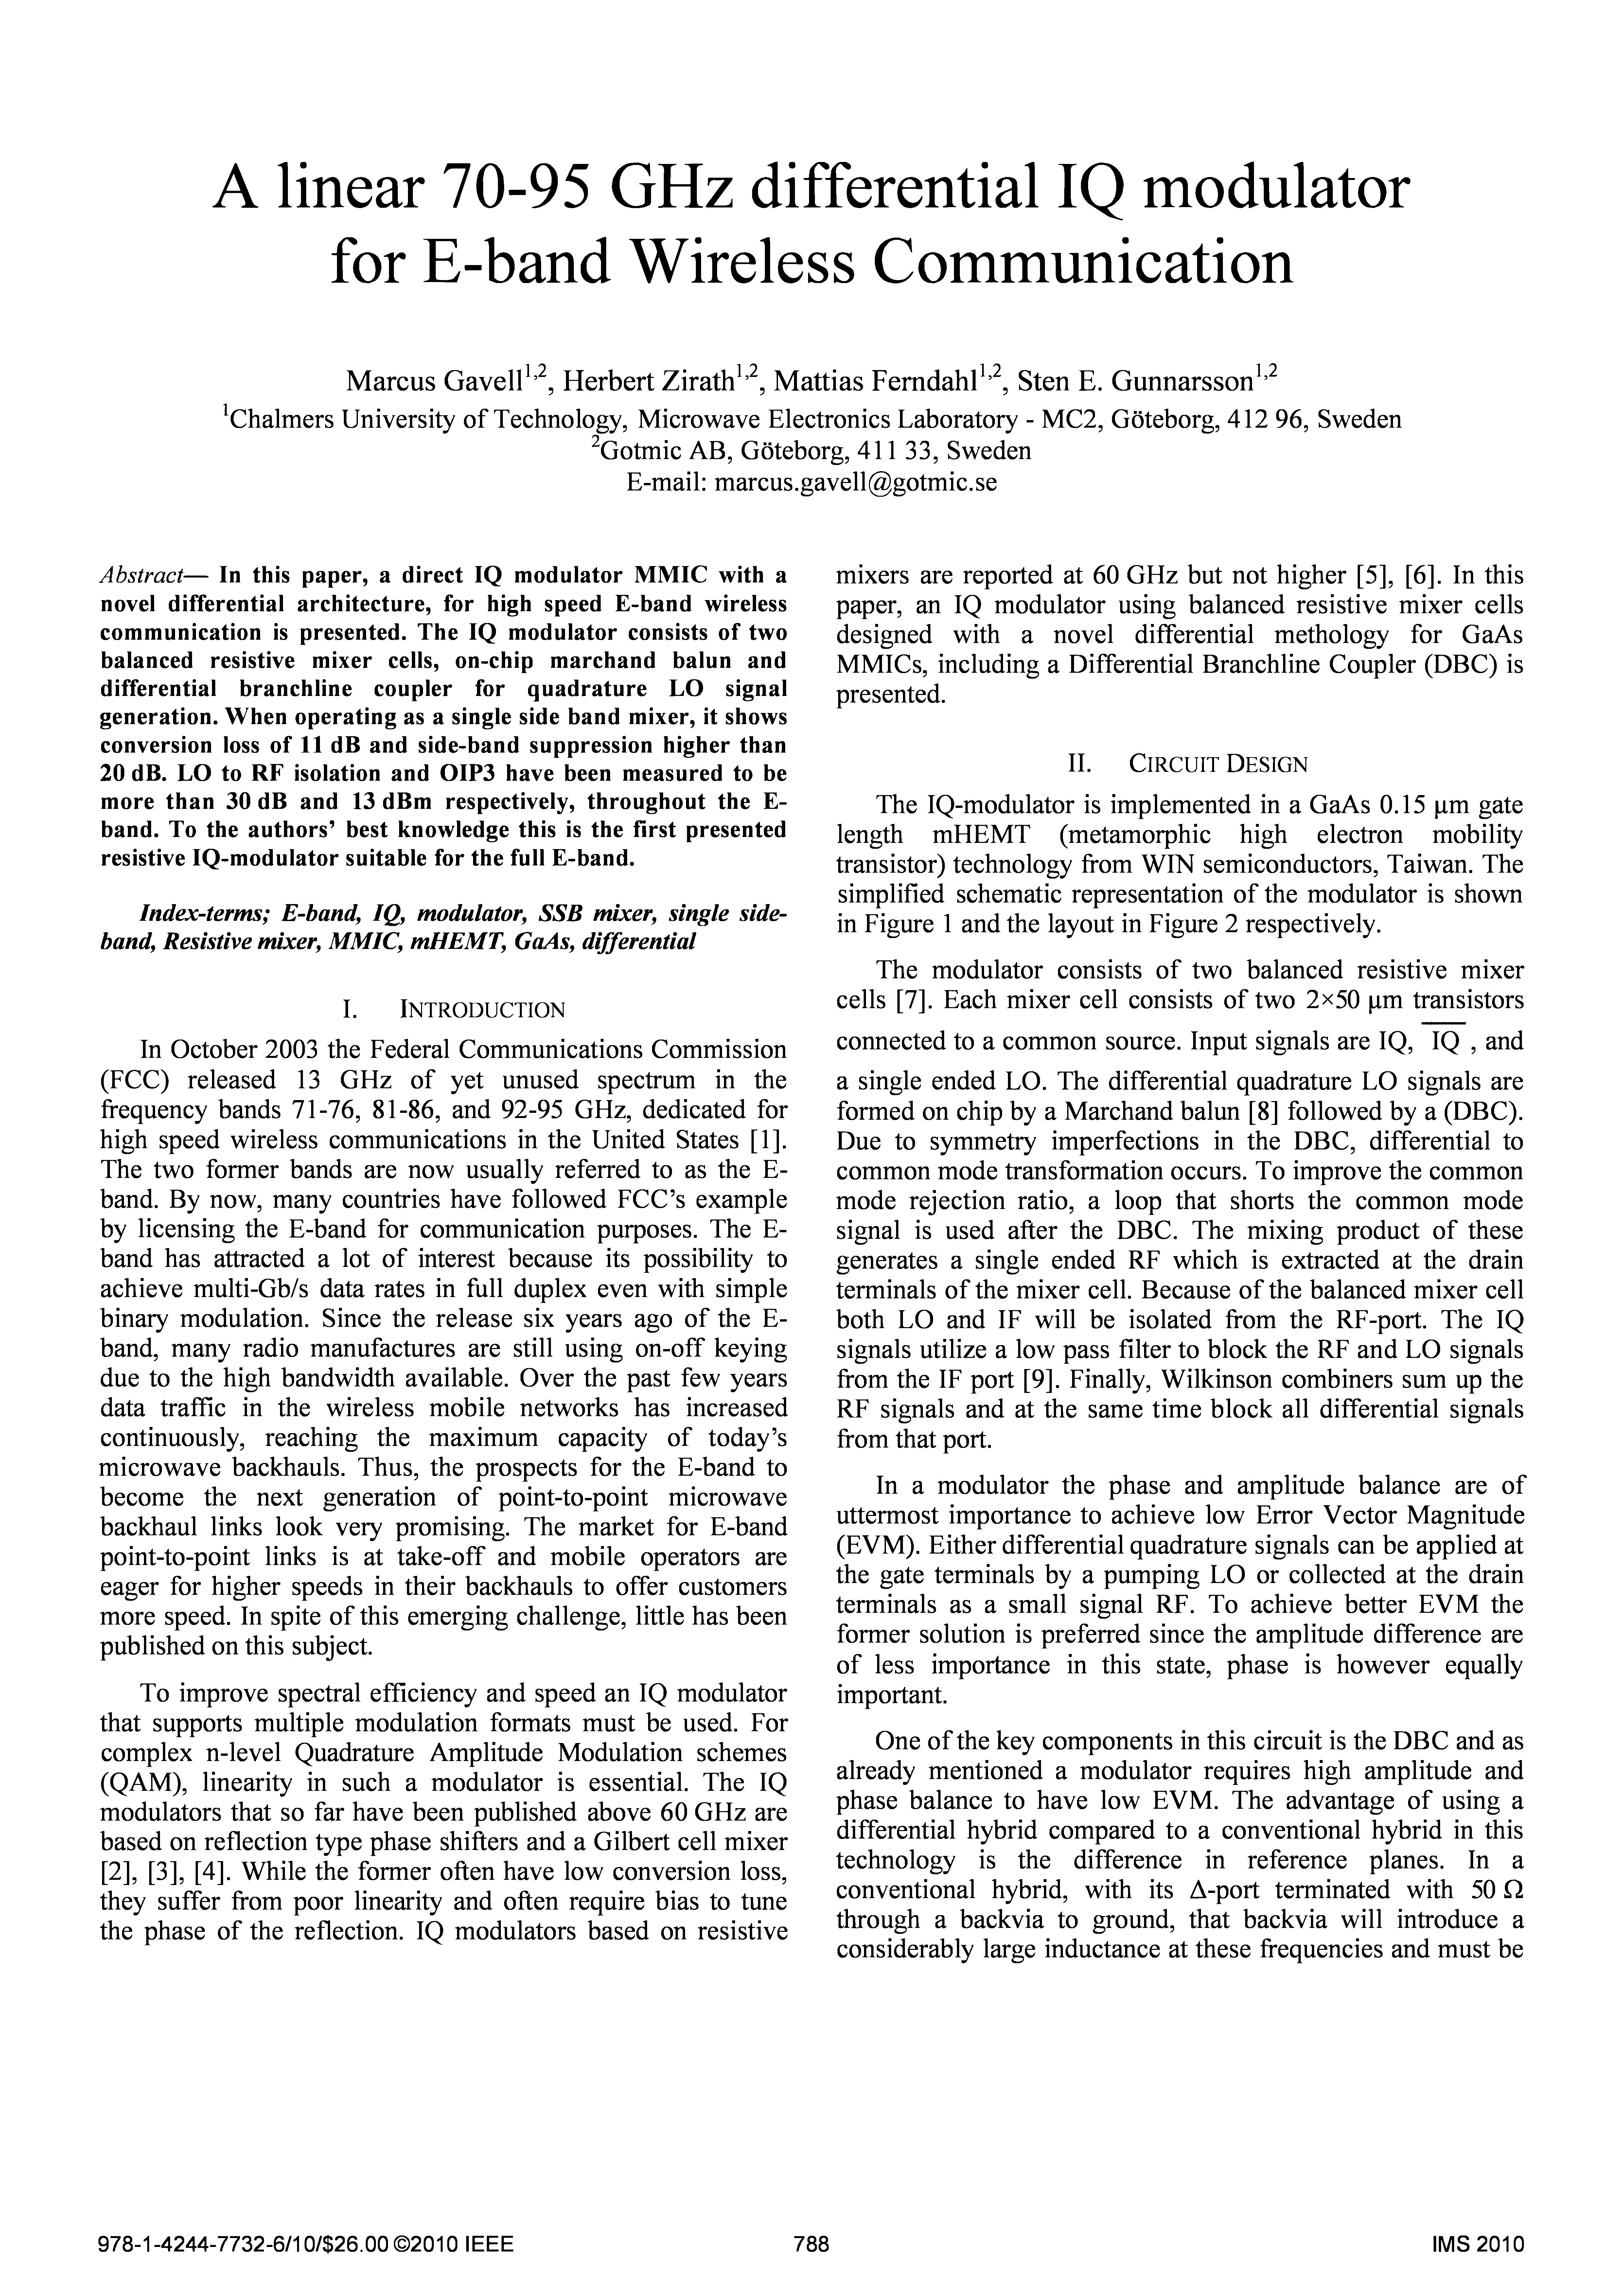 mg-emixer-2010-page-1.png